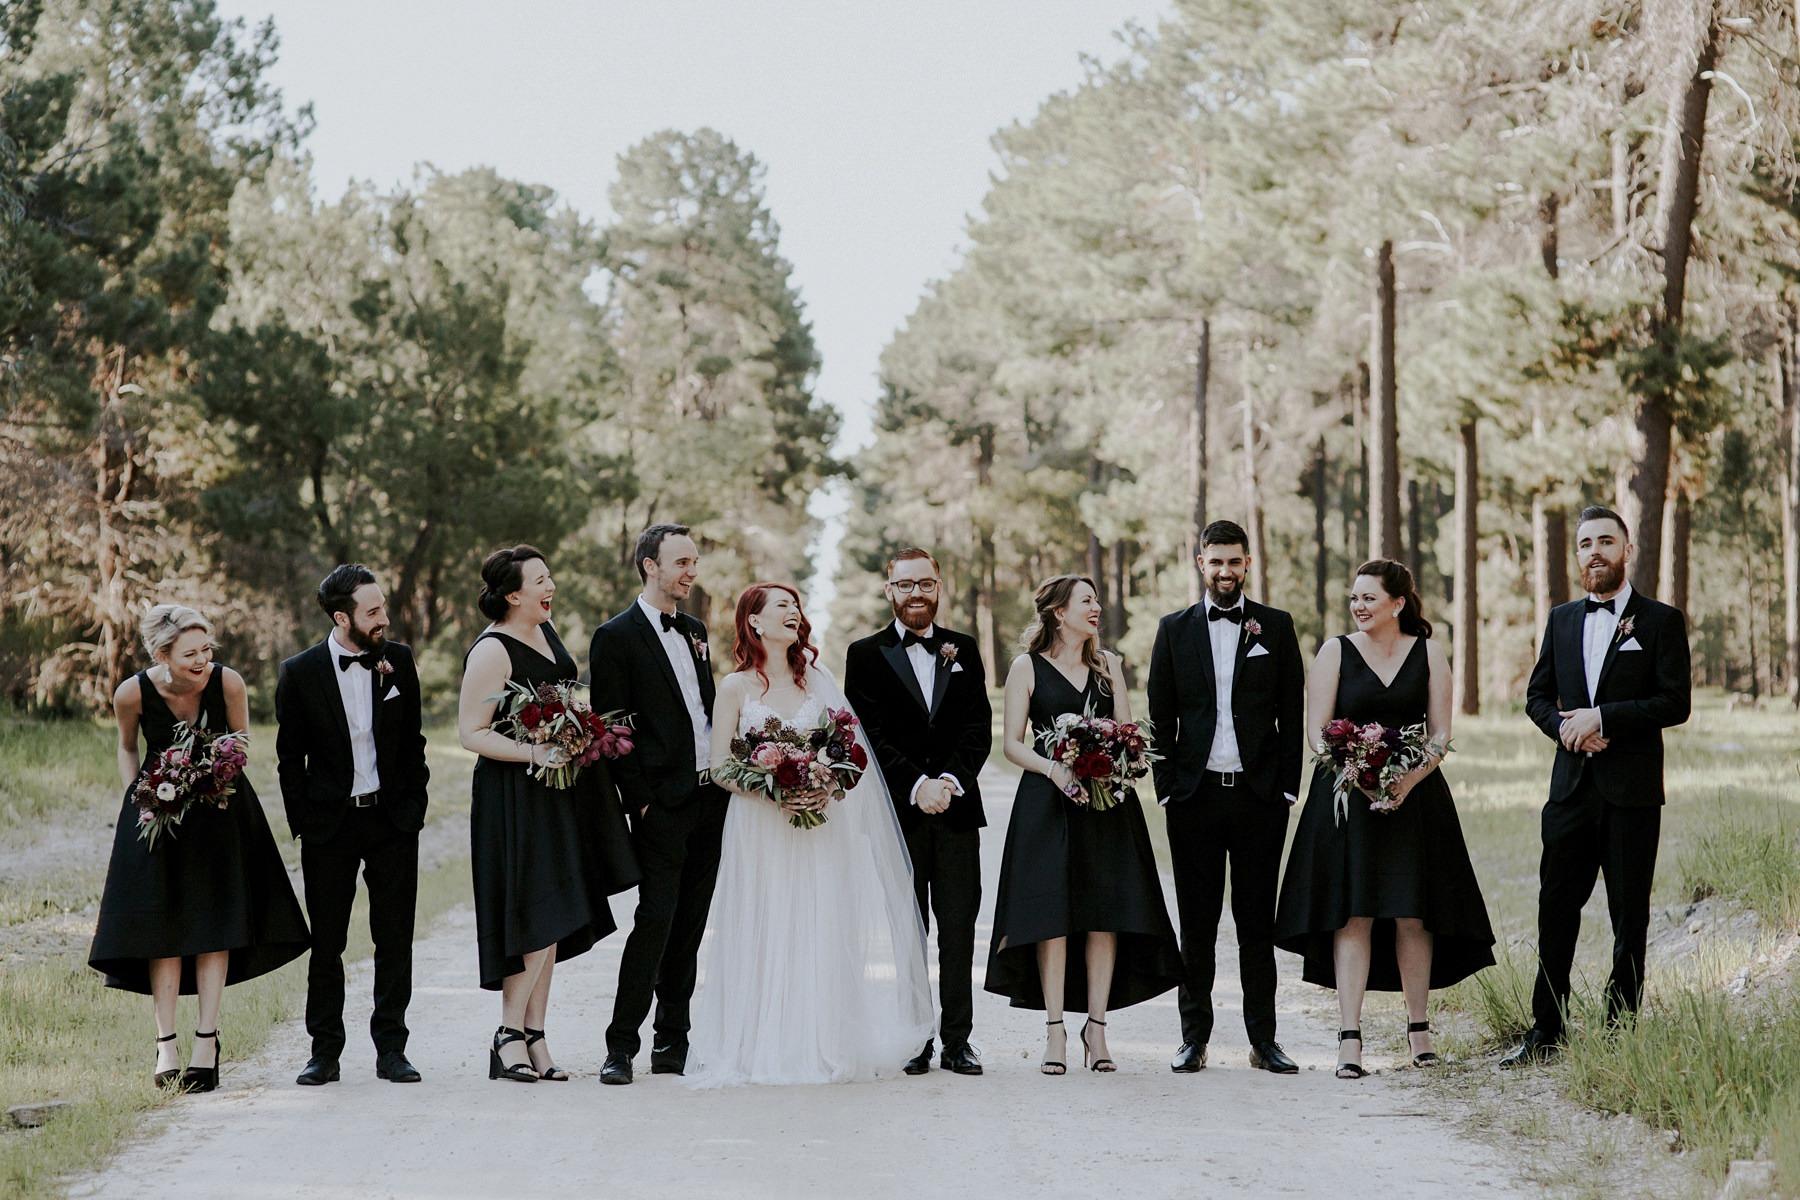 flour-factory-wedding_perth-city-wedding-100